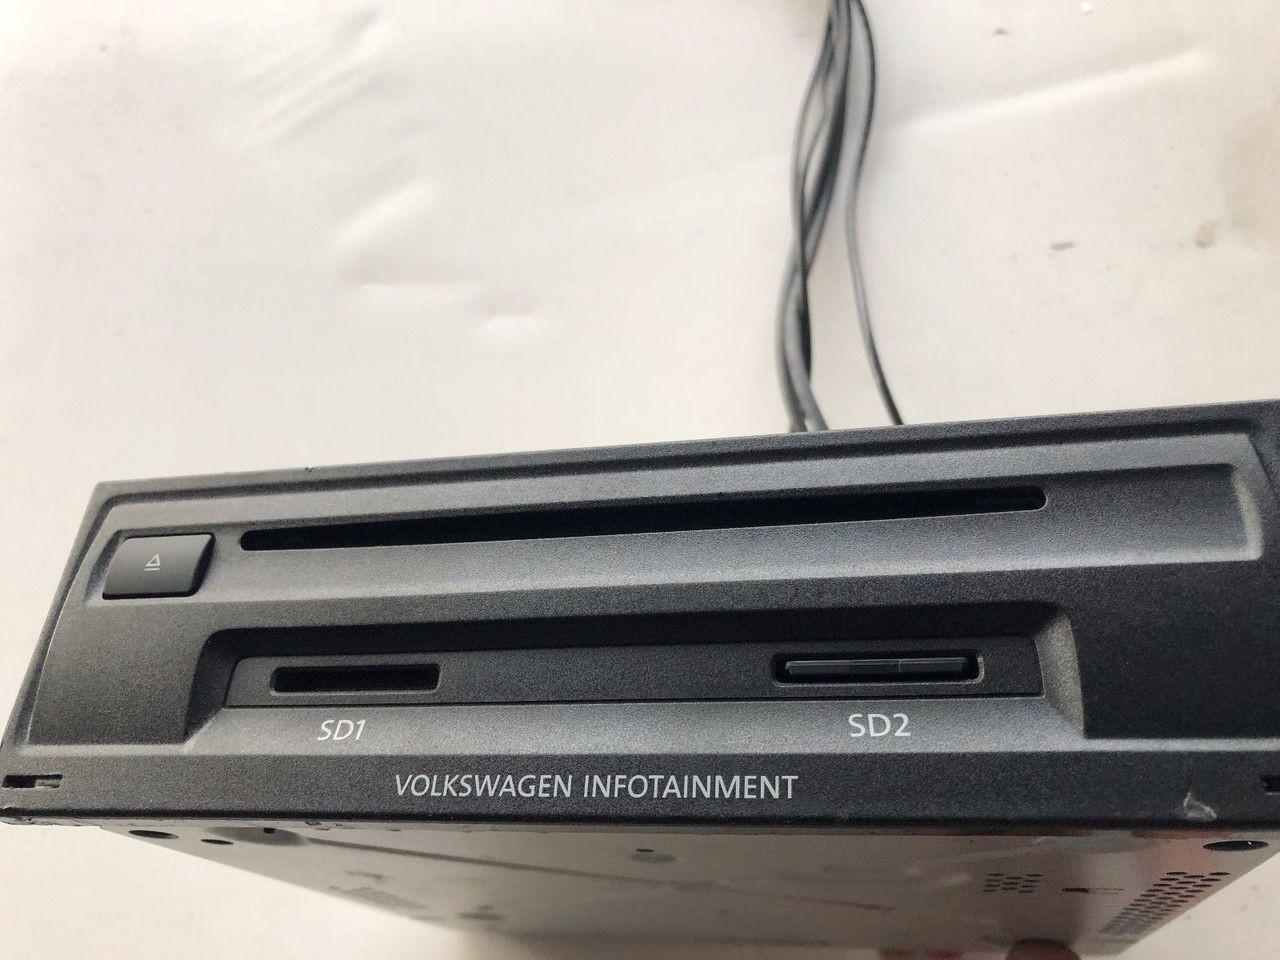 VW GOLF 7 RADIO NAVIGATION SYSTEM DISCOVER MEDIA NAVI MIB2 3Q0035846